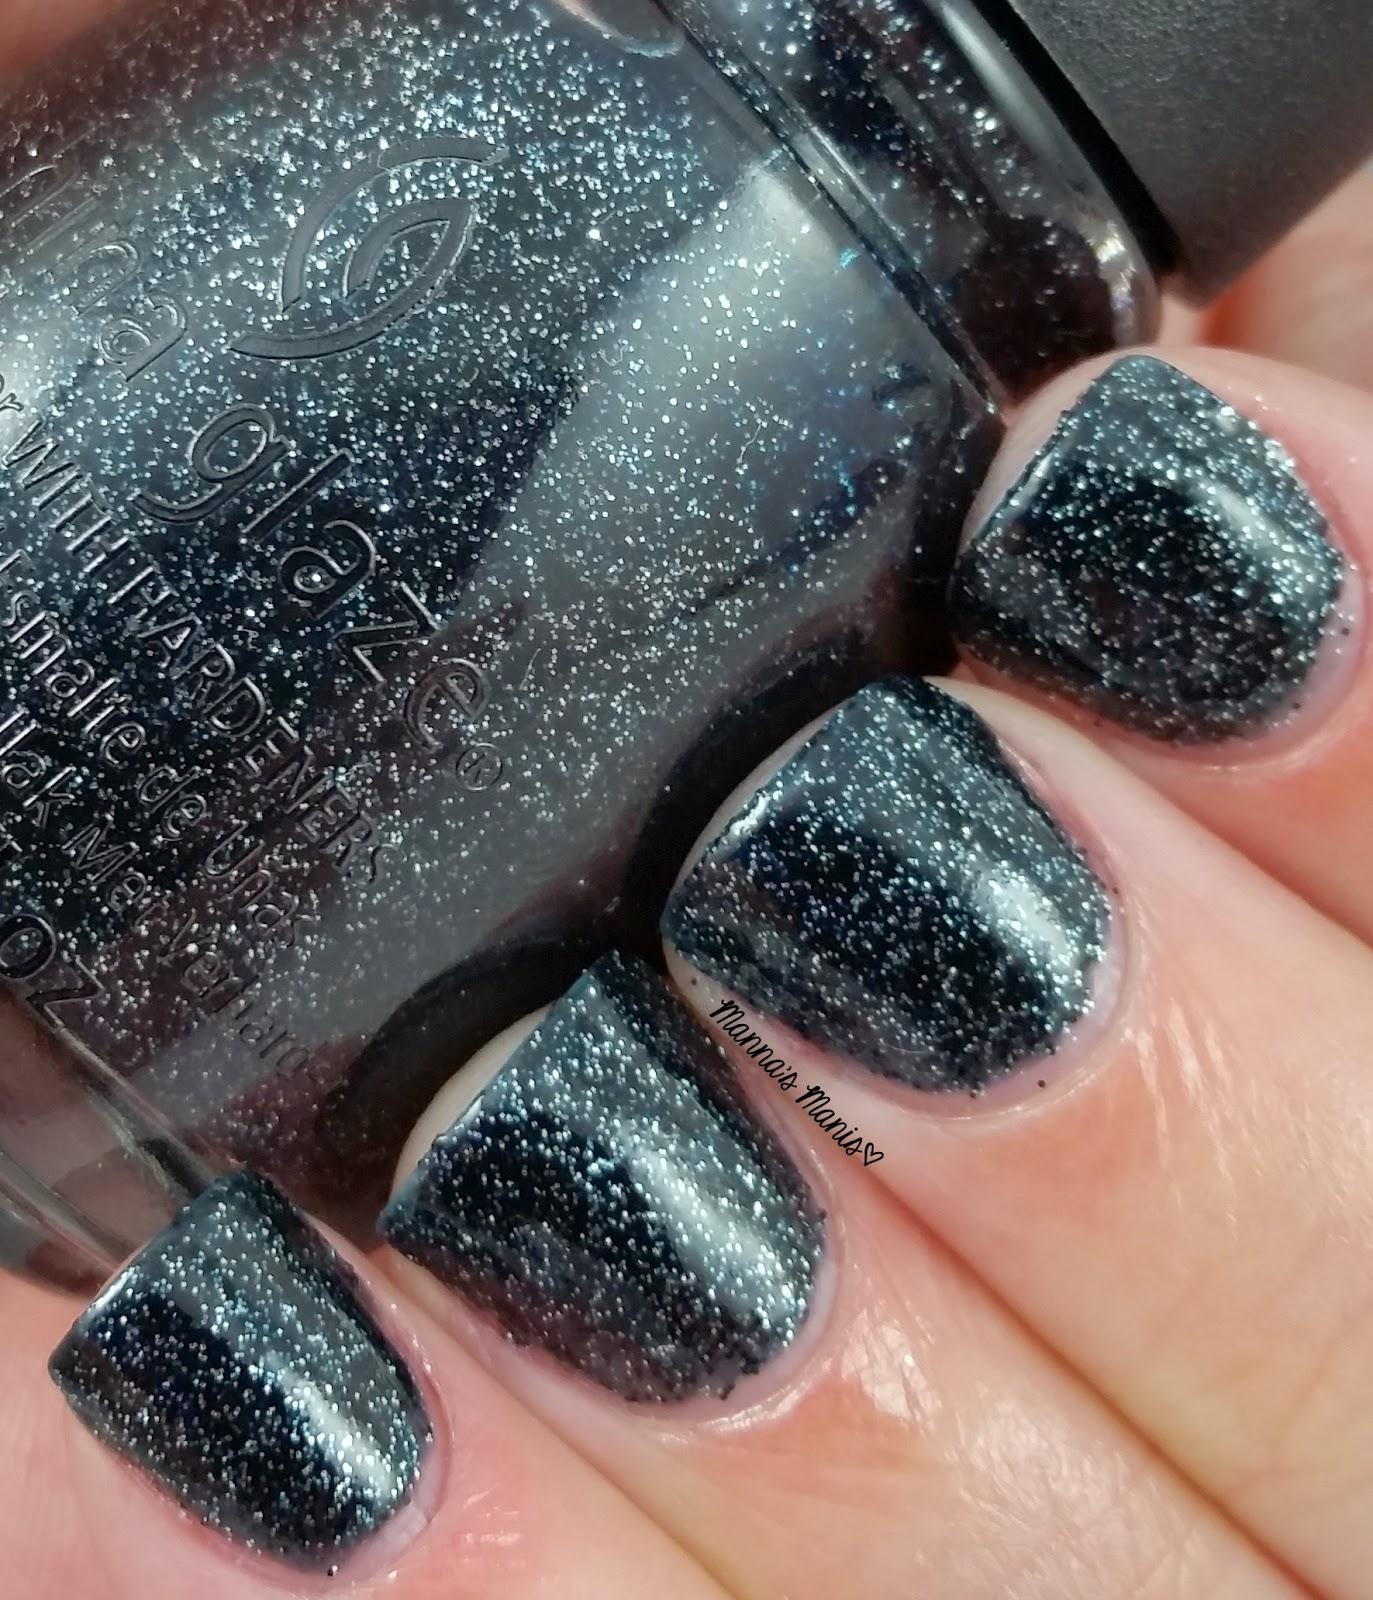 china glaze meet me under the stars, a silver and black glitter nail polish